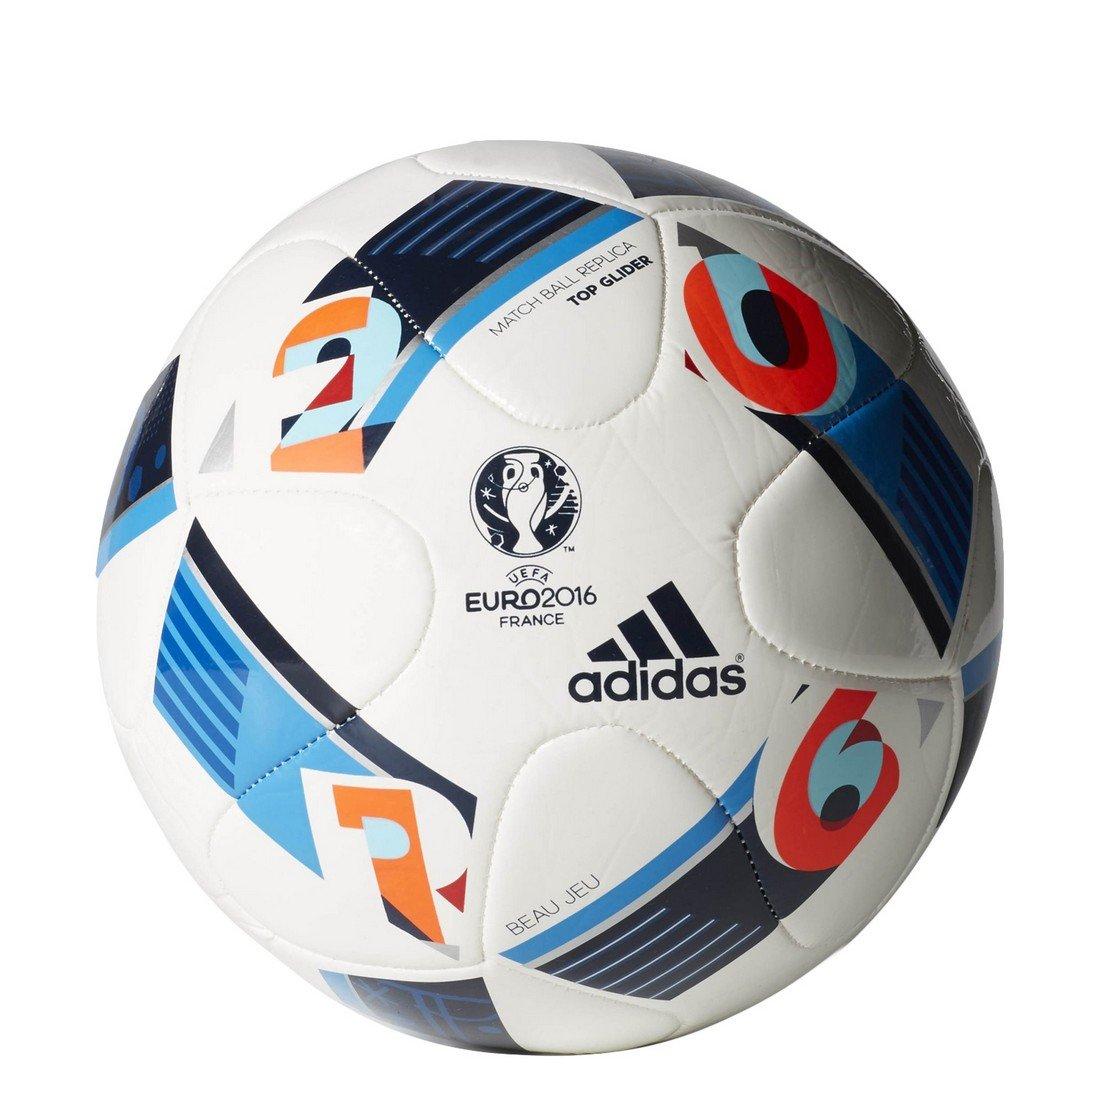 buy adidas euro 16 topgli football mens size 5 white online at low prices in india amazonin